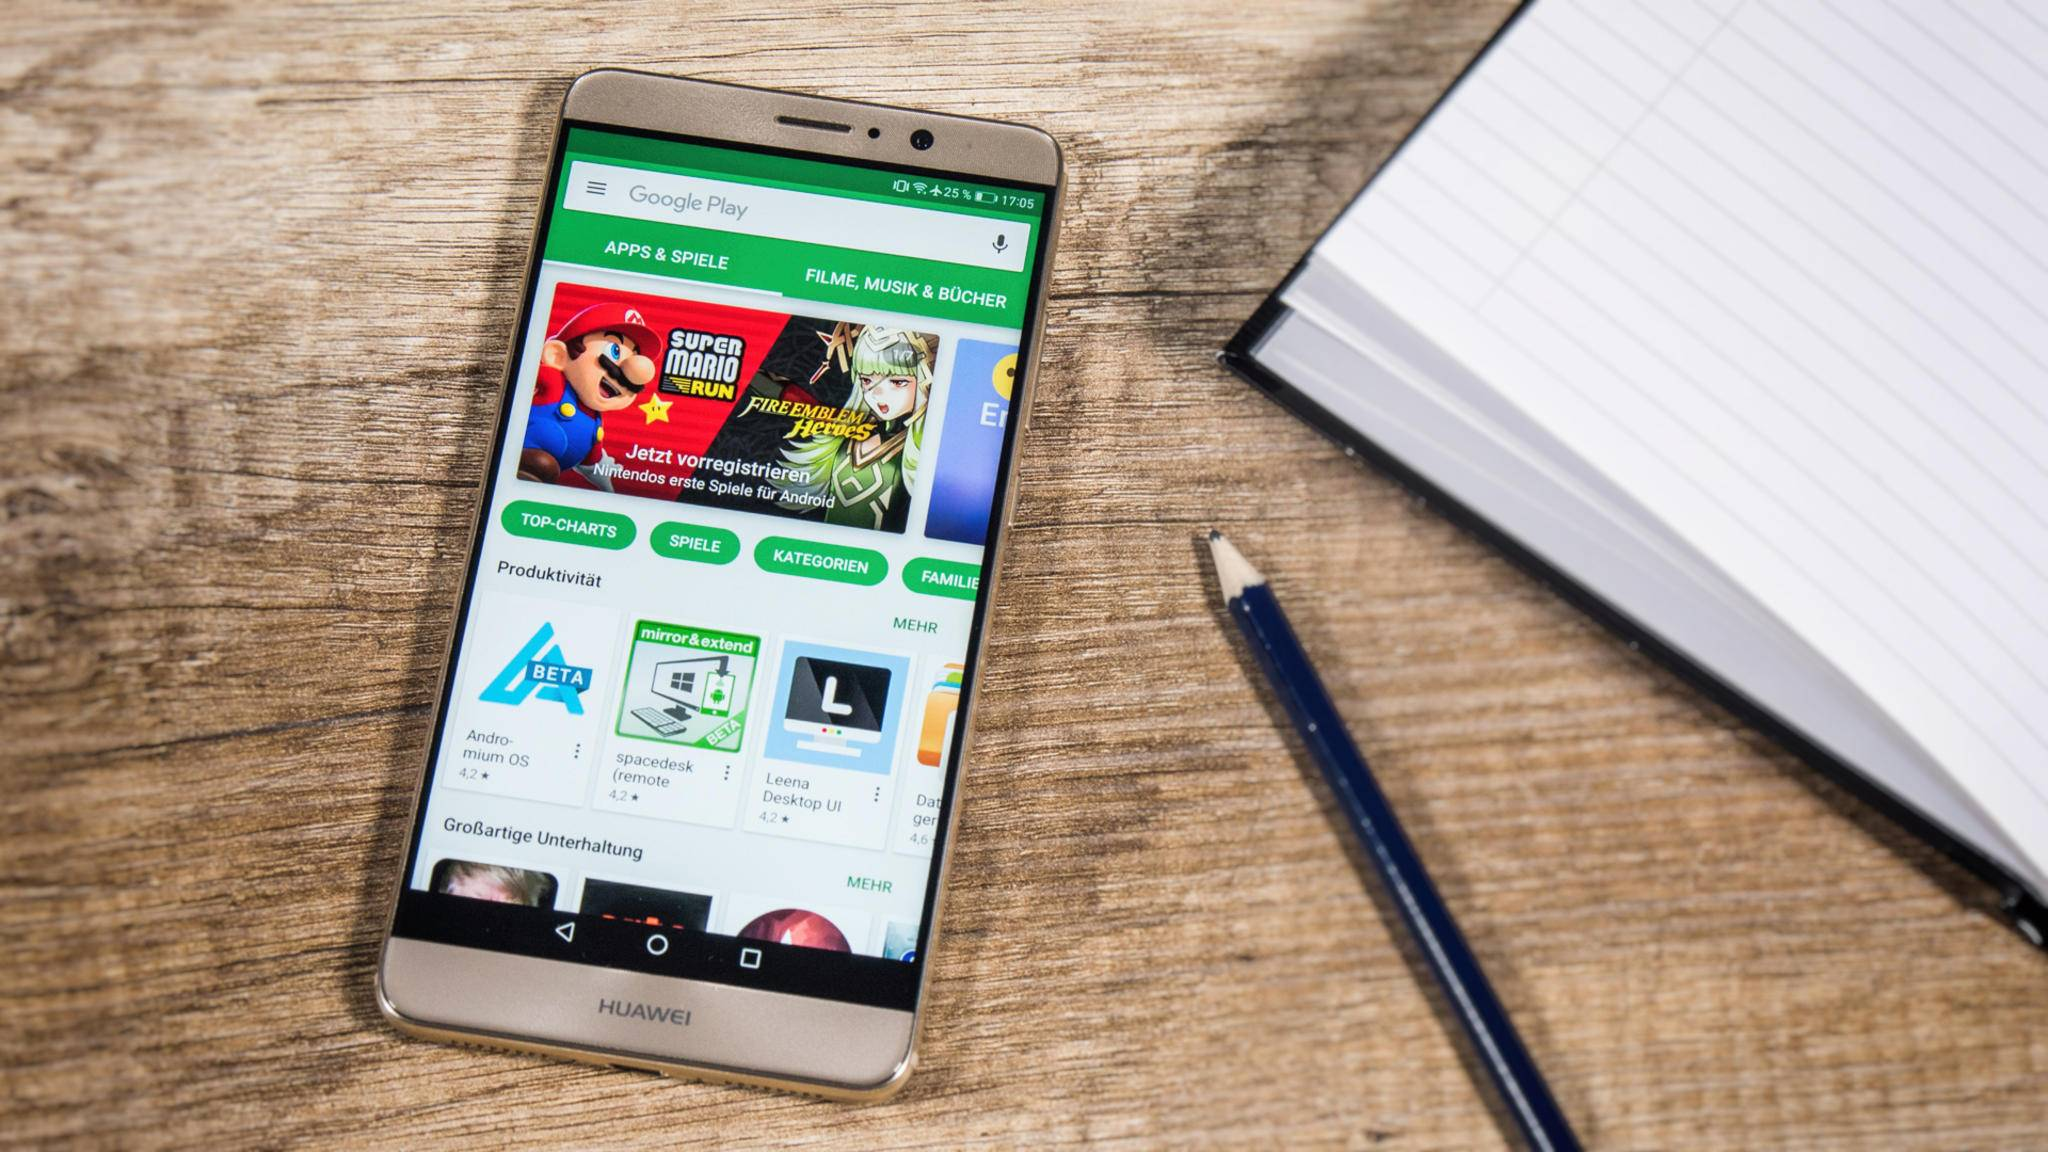 Wir verraten Dir, wie Du den Google Play Store auf Smartphones installiert bekommst.